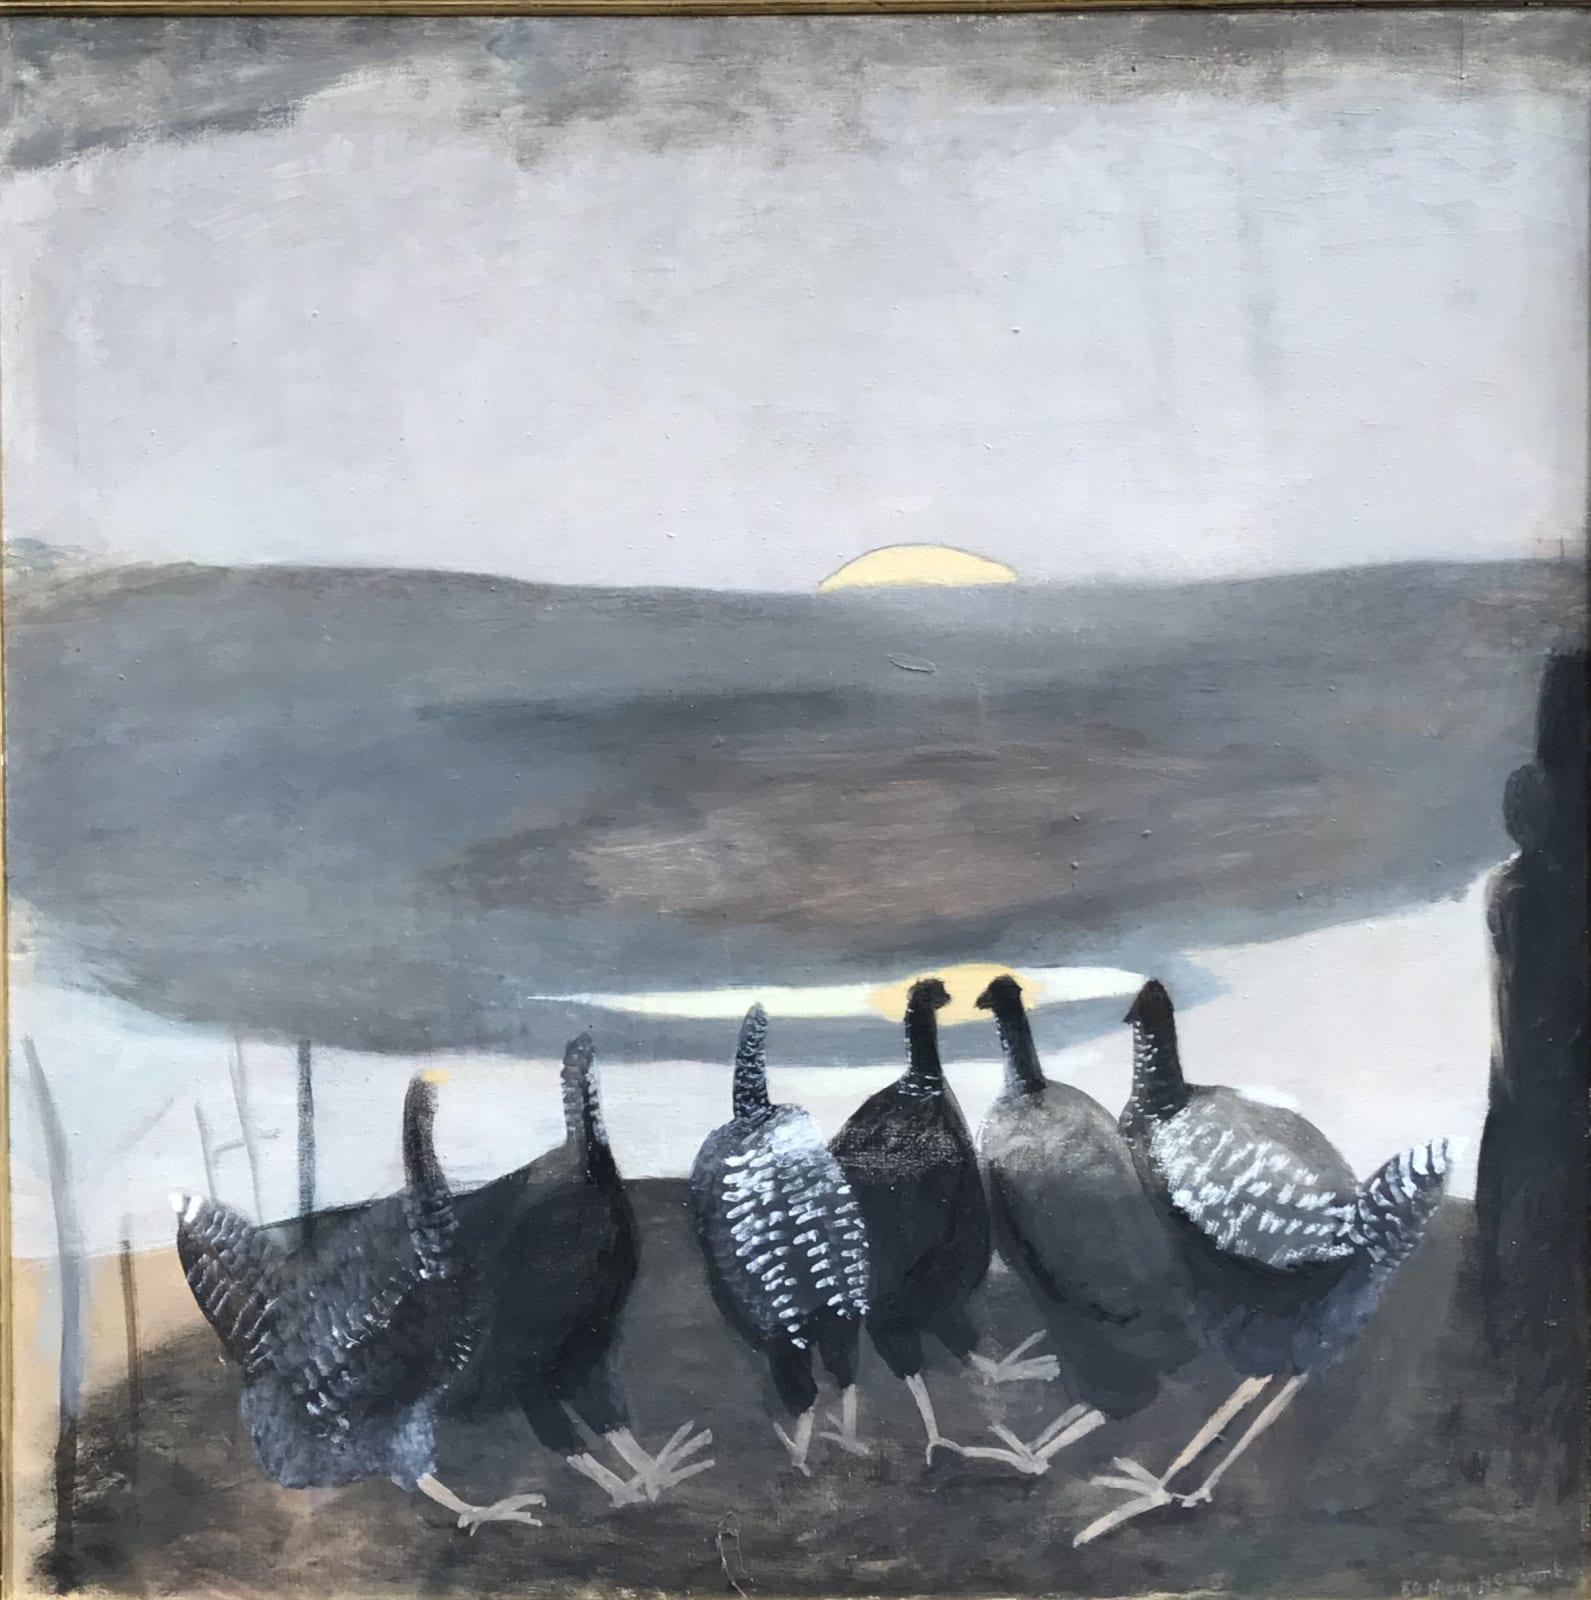 Mary Newcomb, The Bulging Sun, 1980